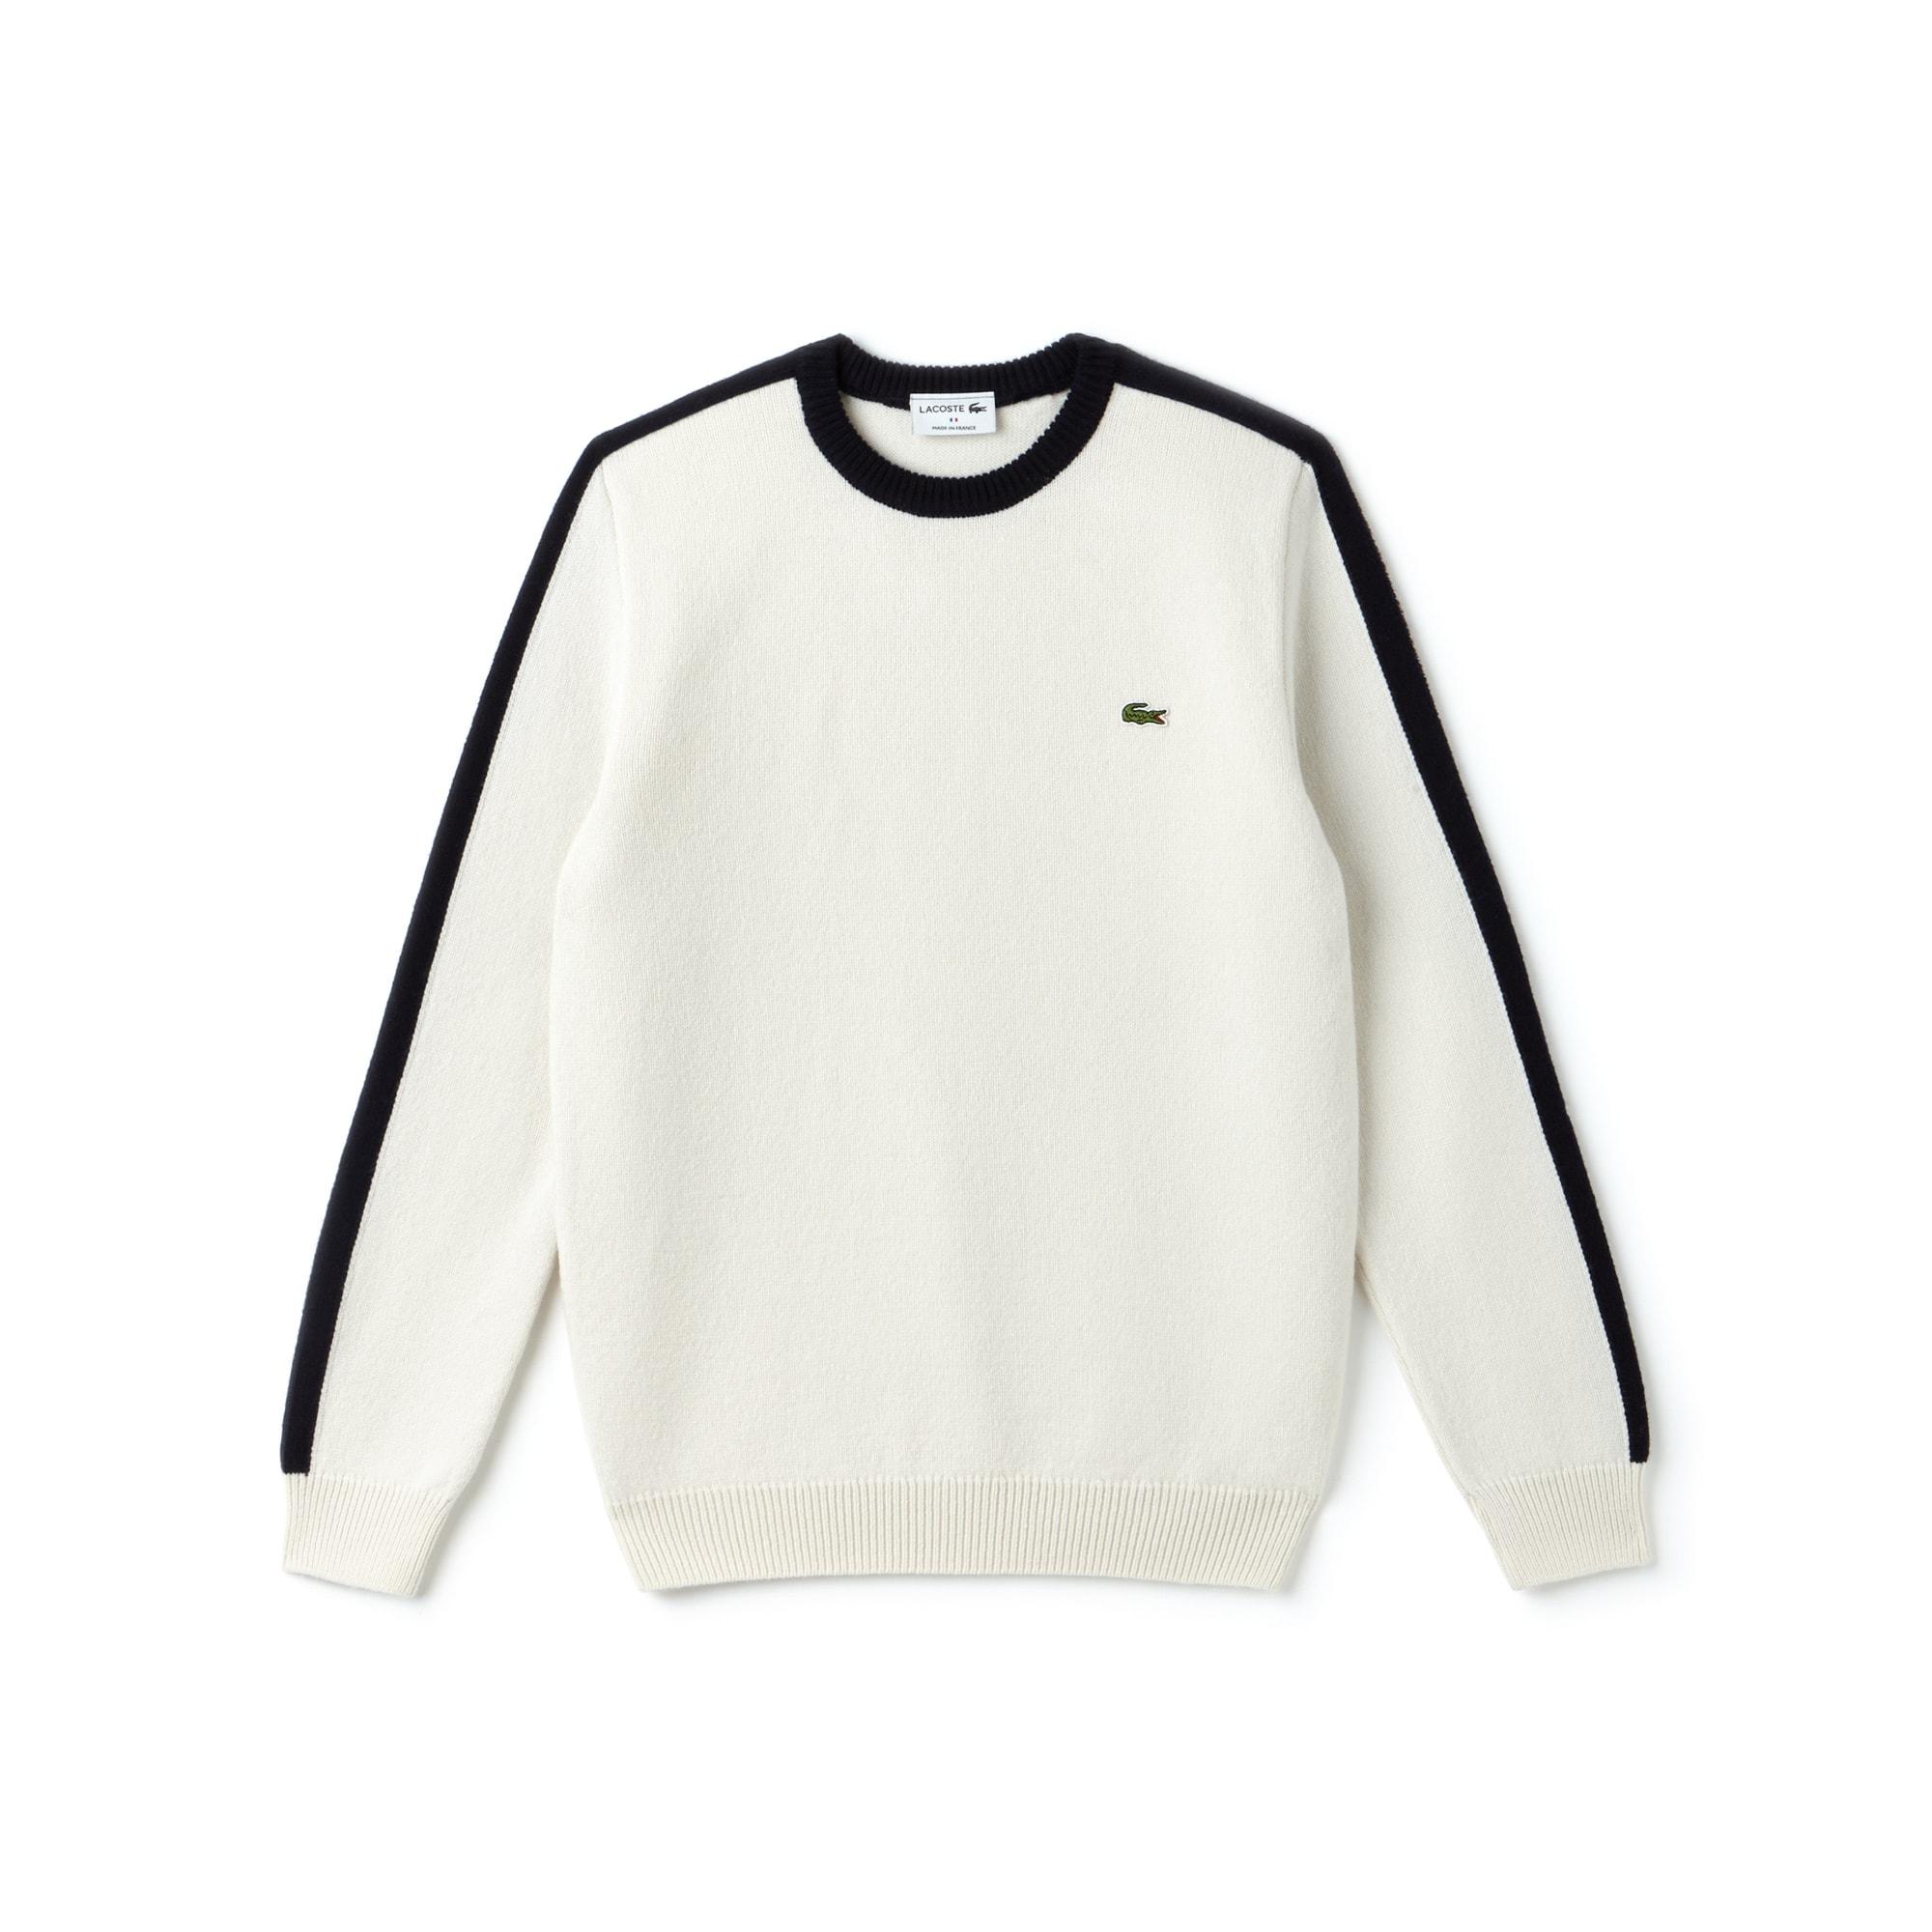 Pullover a girocollo Made in France in jersey con fasce a contrasto